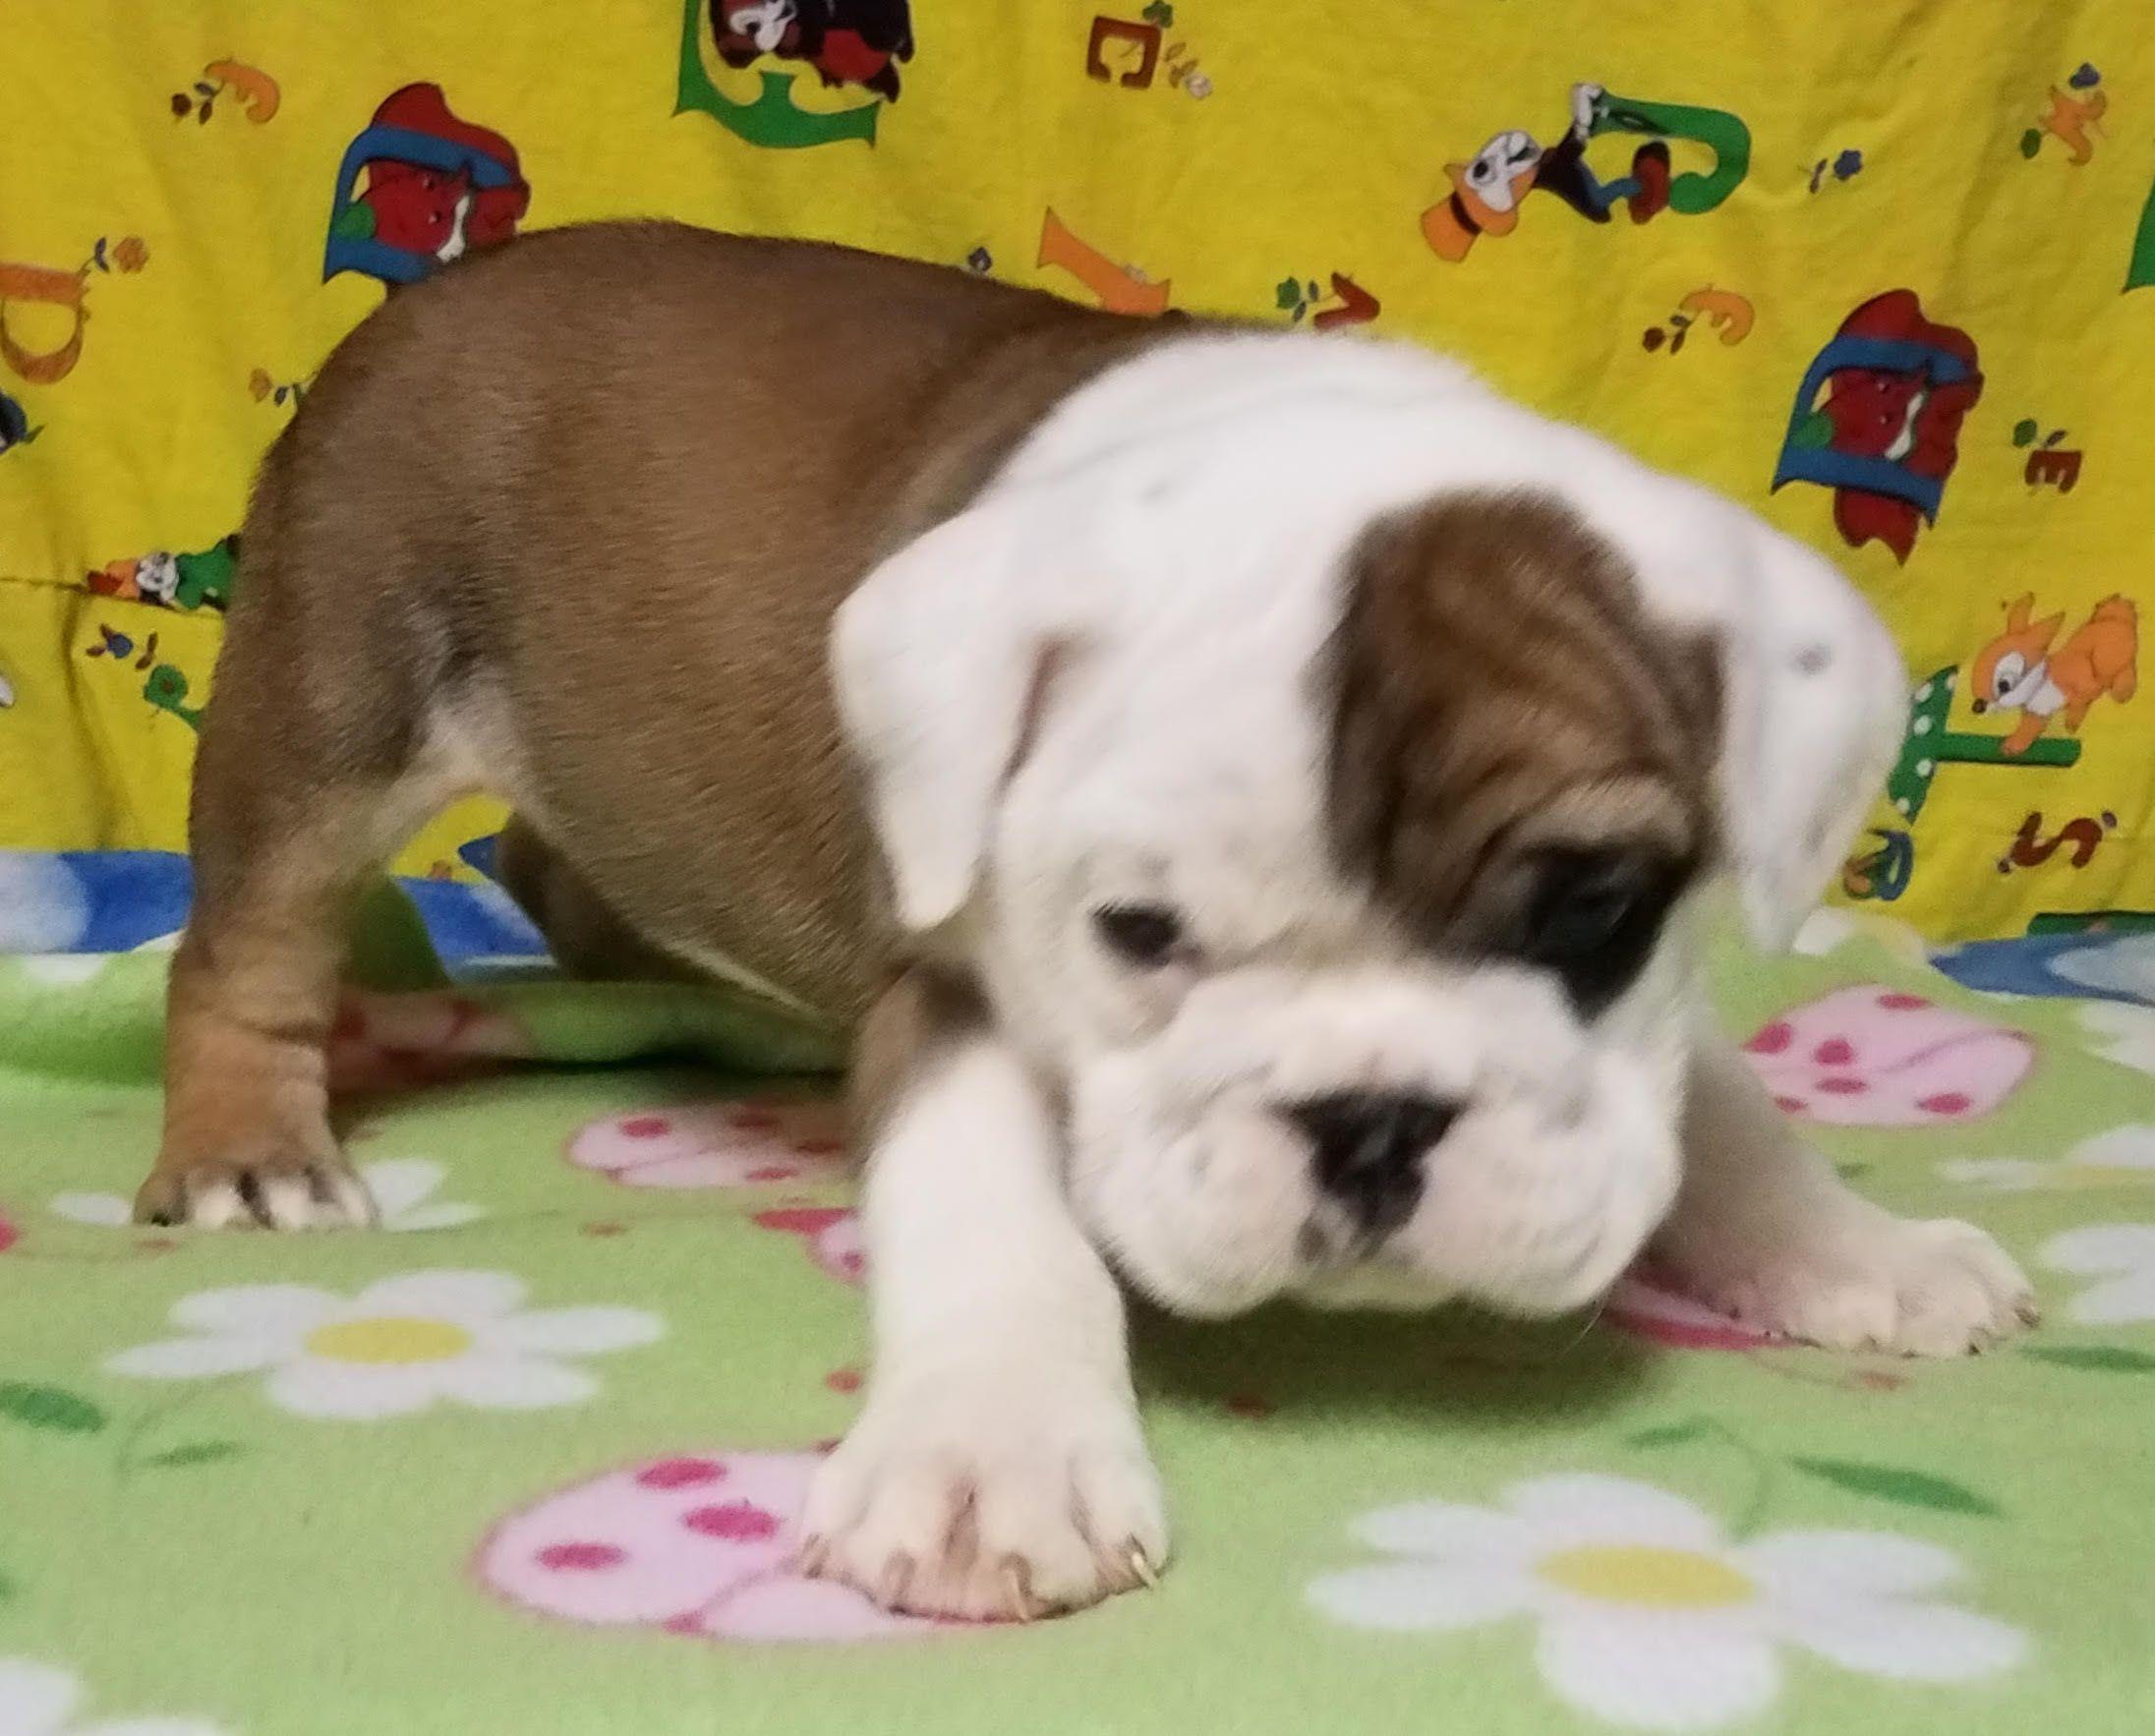 Koko Is A Fawn Female English Bulldog Puppy American Born And